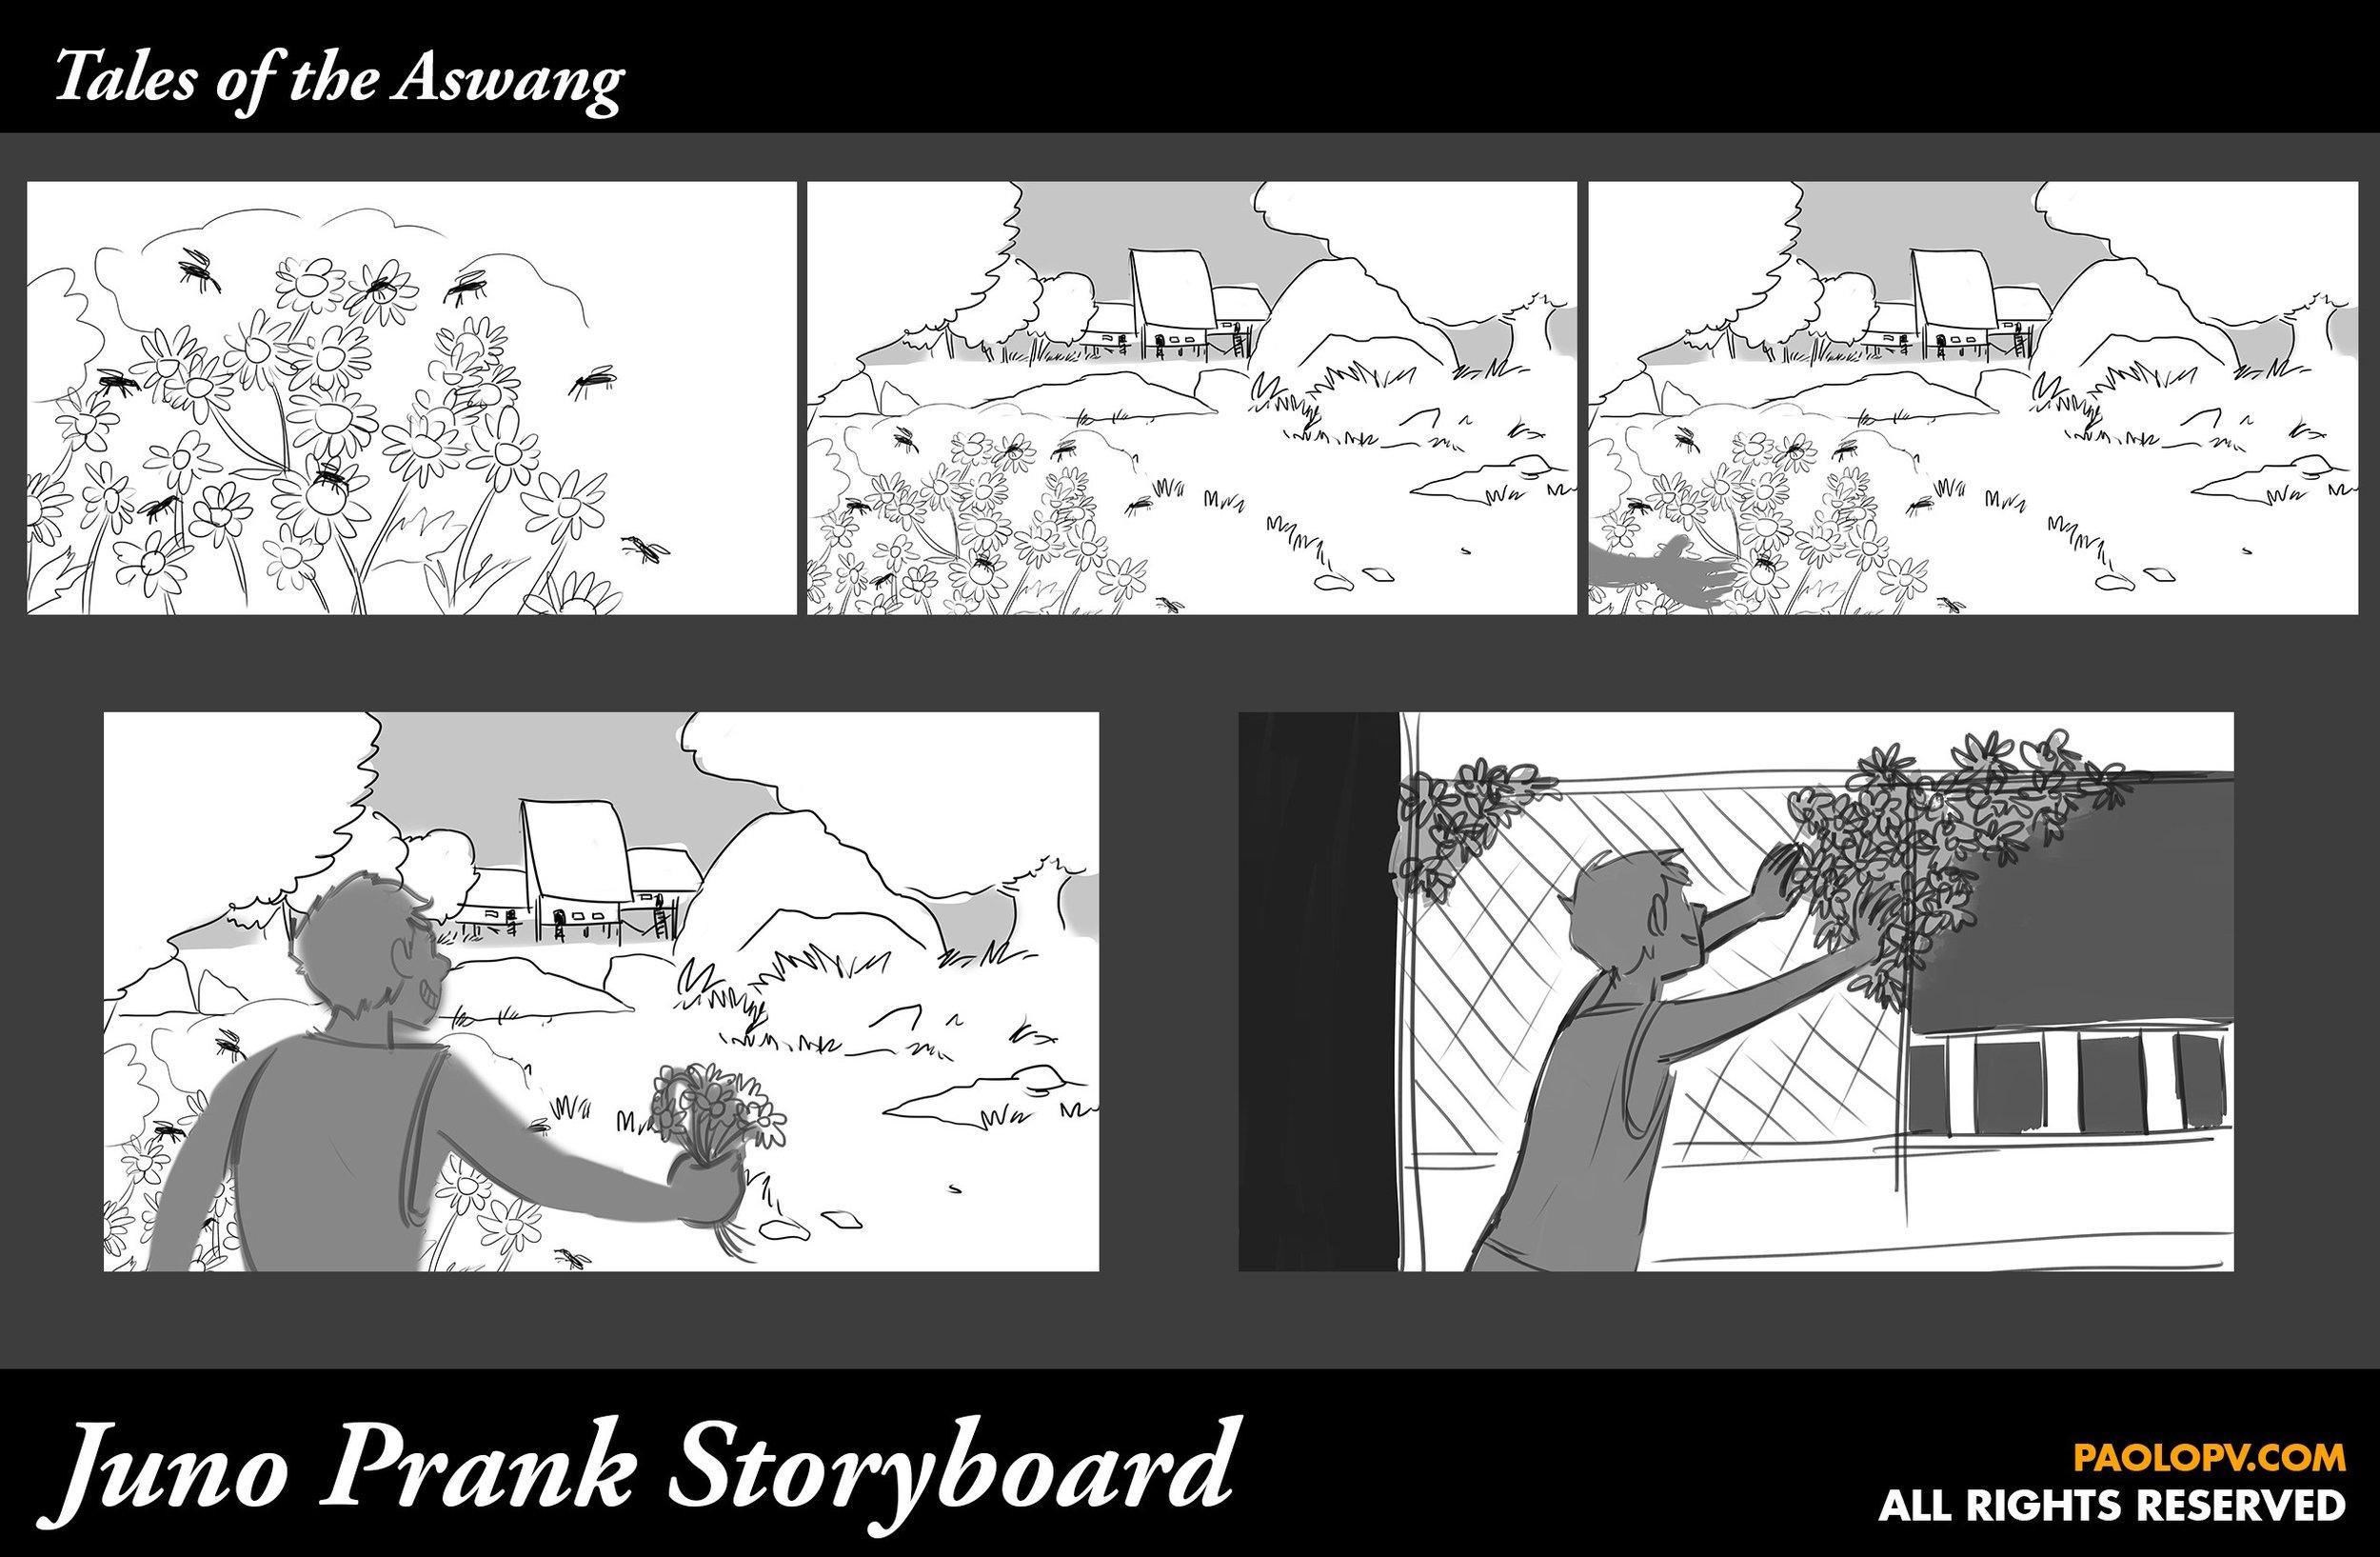 Tales-of-the-Aswang-Storyboard-Juno-Prank.jpg